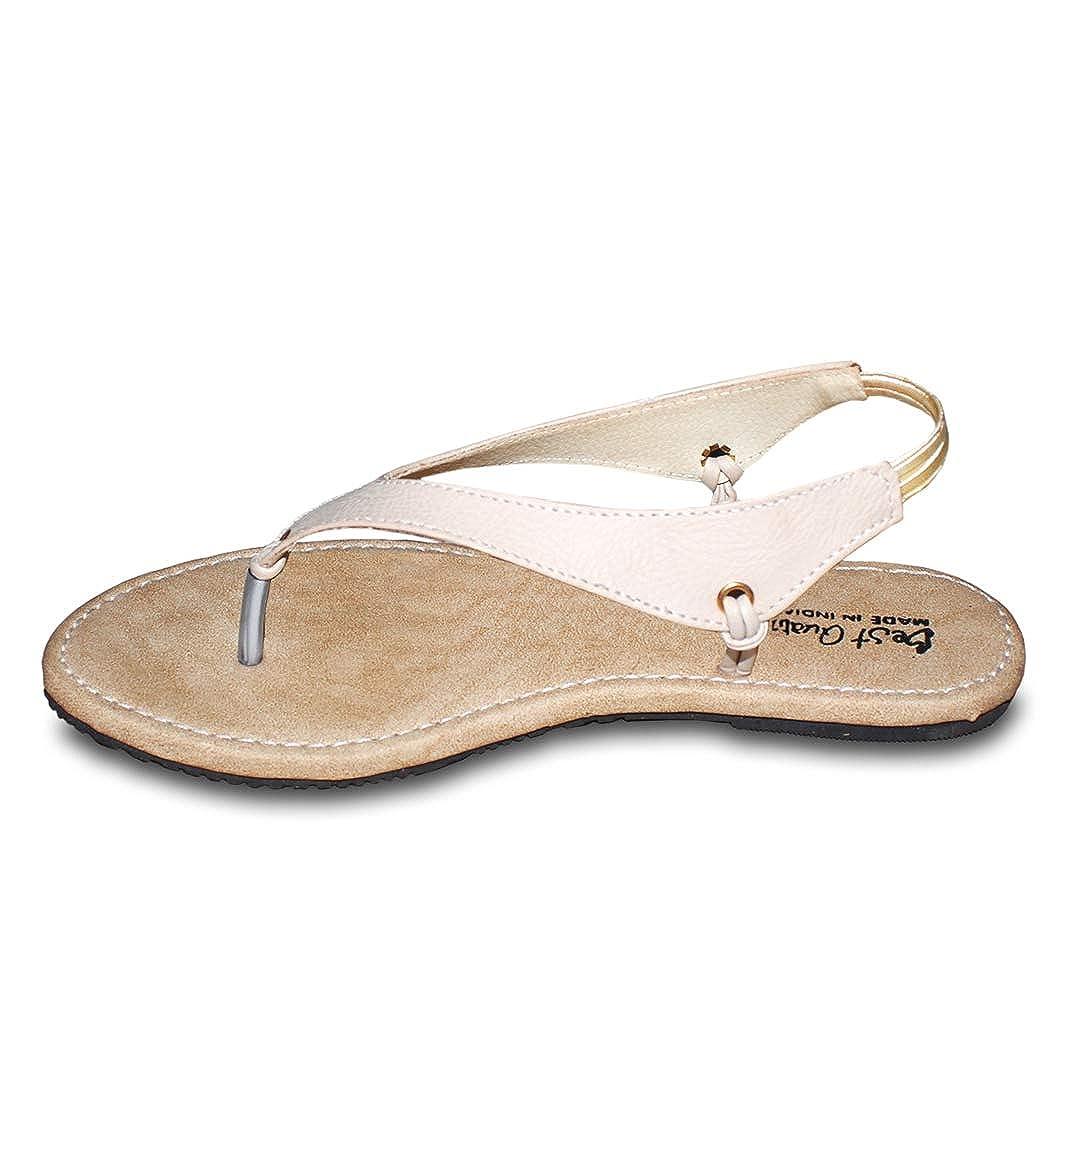 Flat Chappal | Sandal for Regular Wear